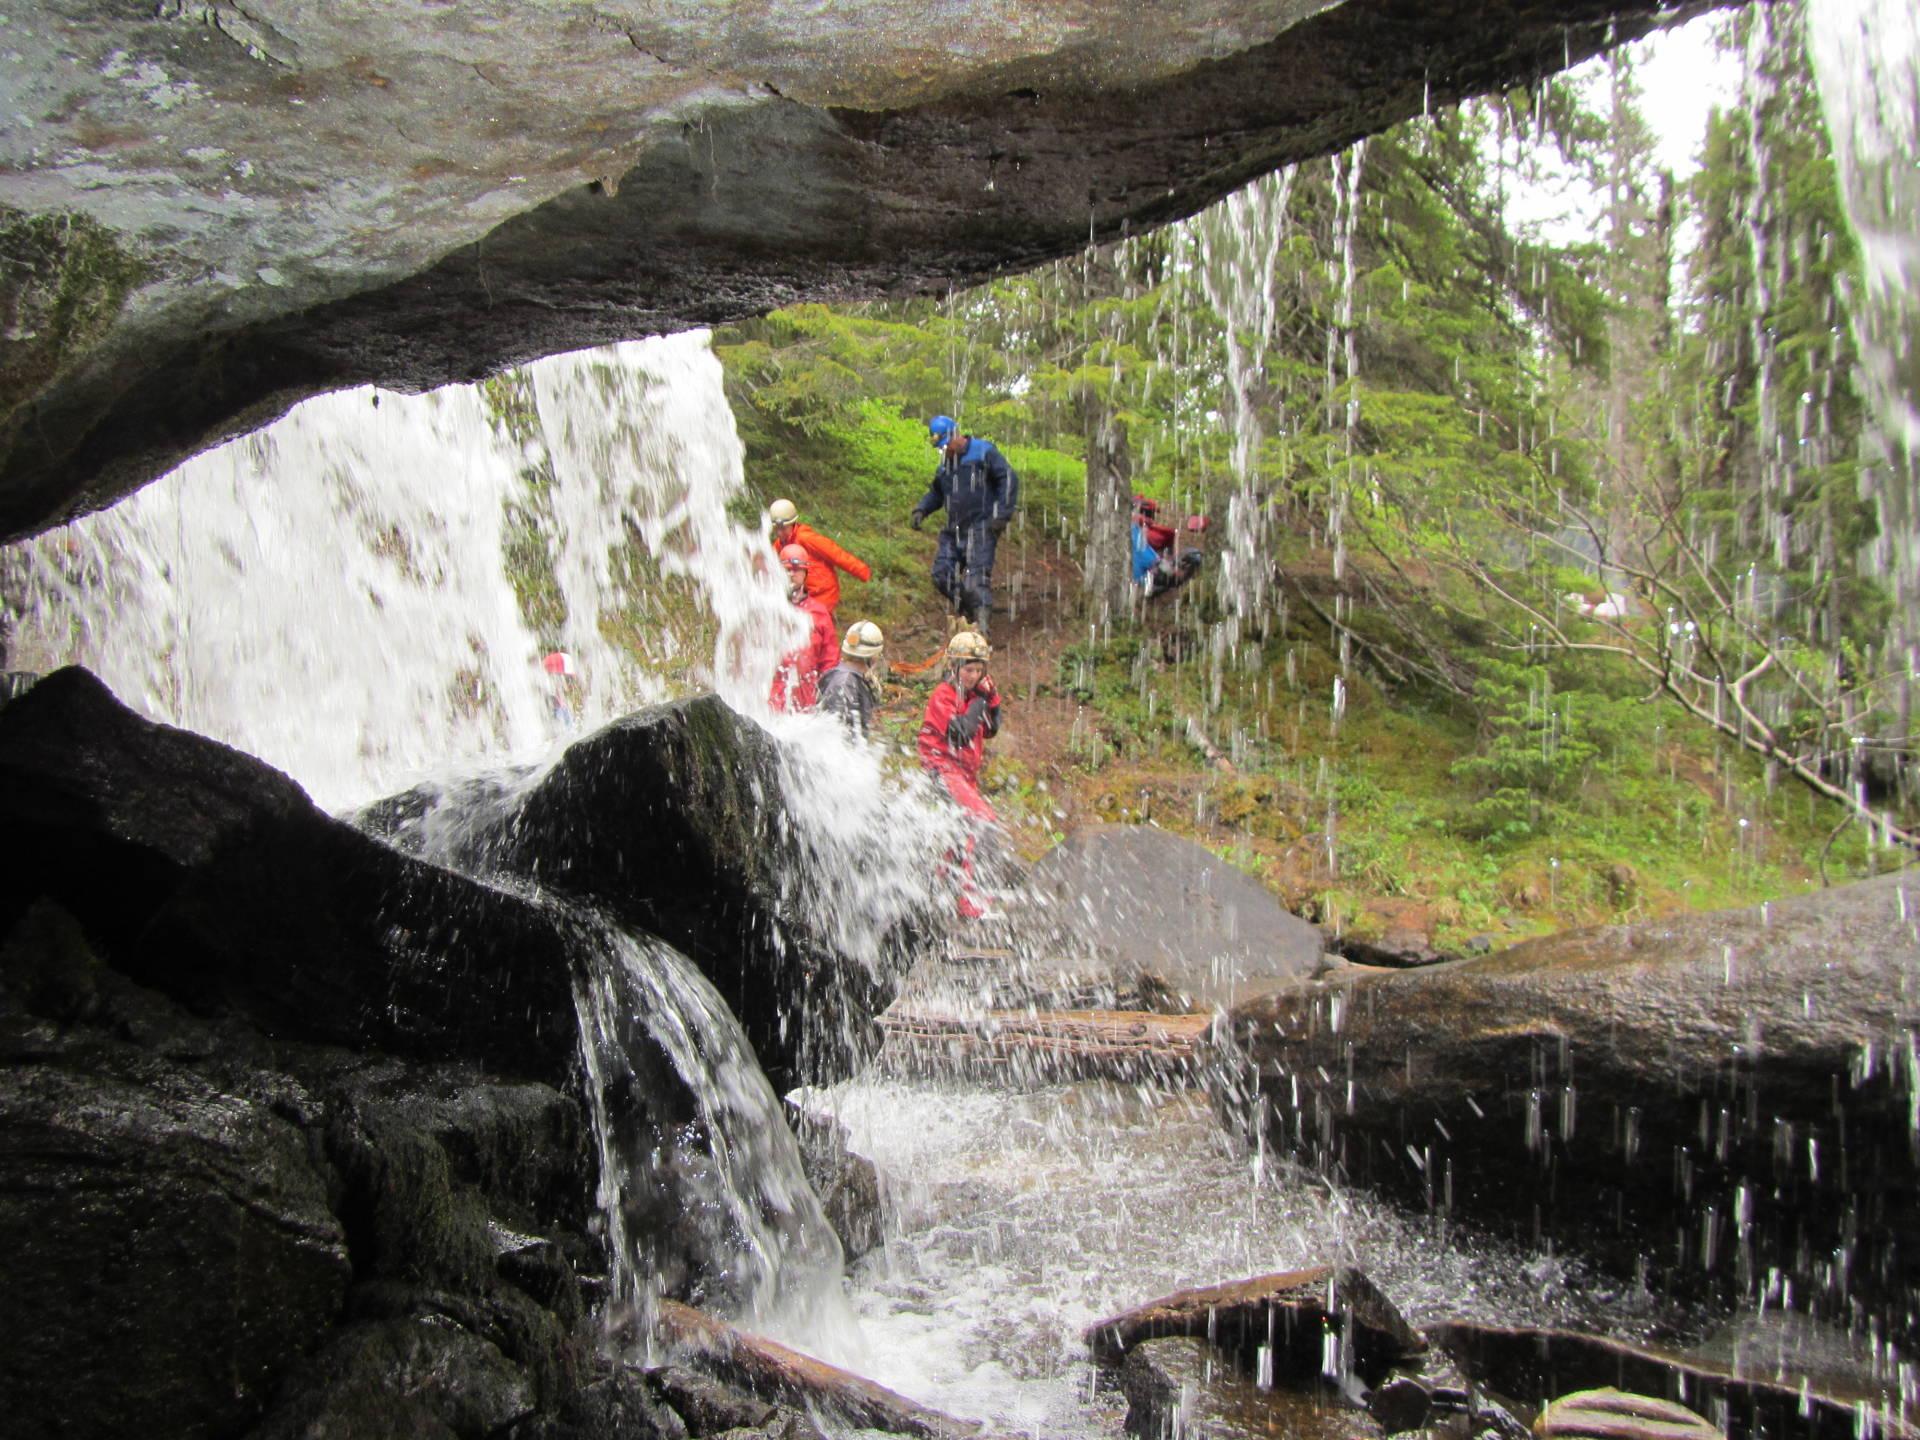 Grottur till Bergsjögrottan